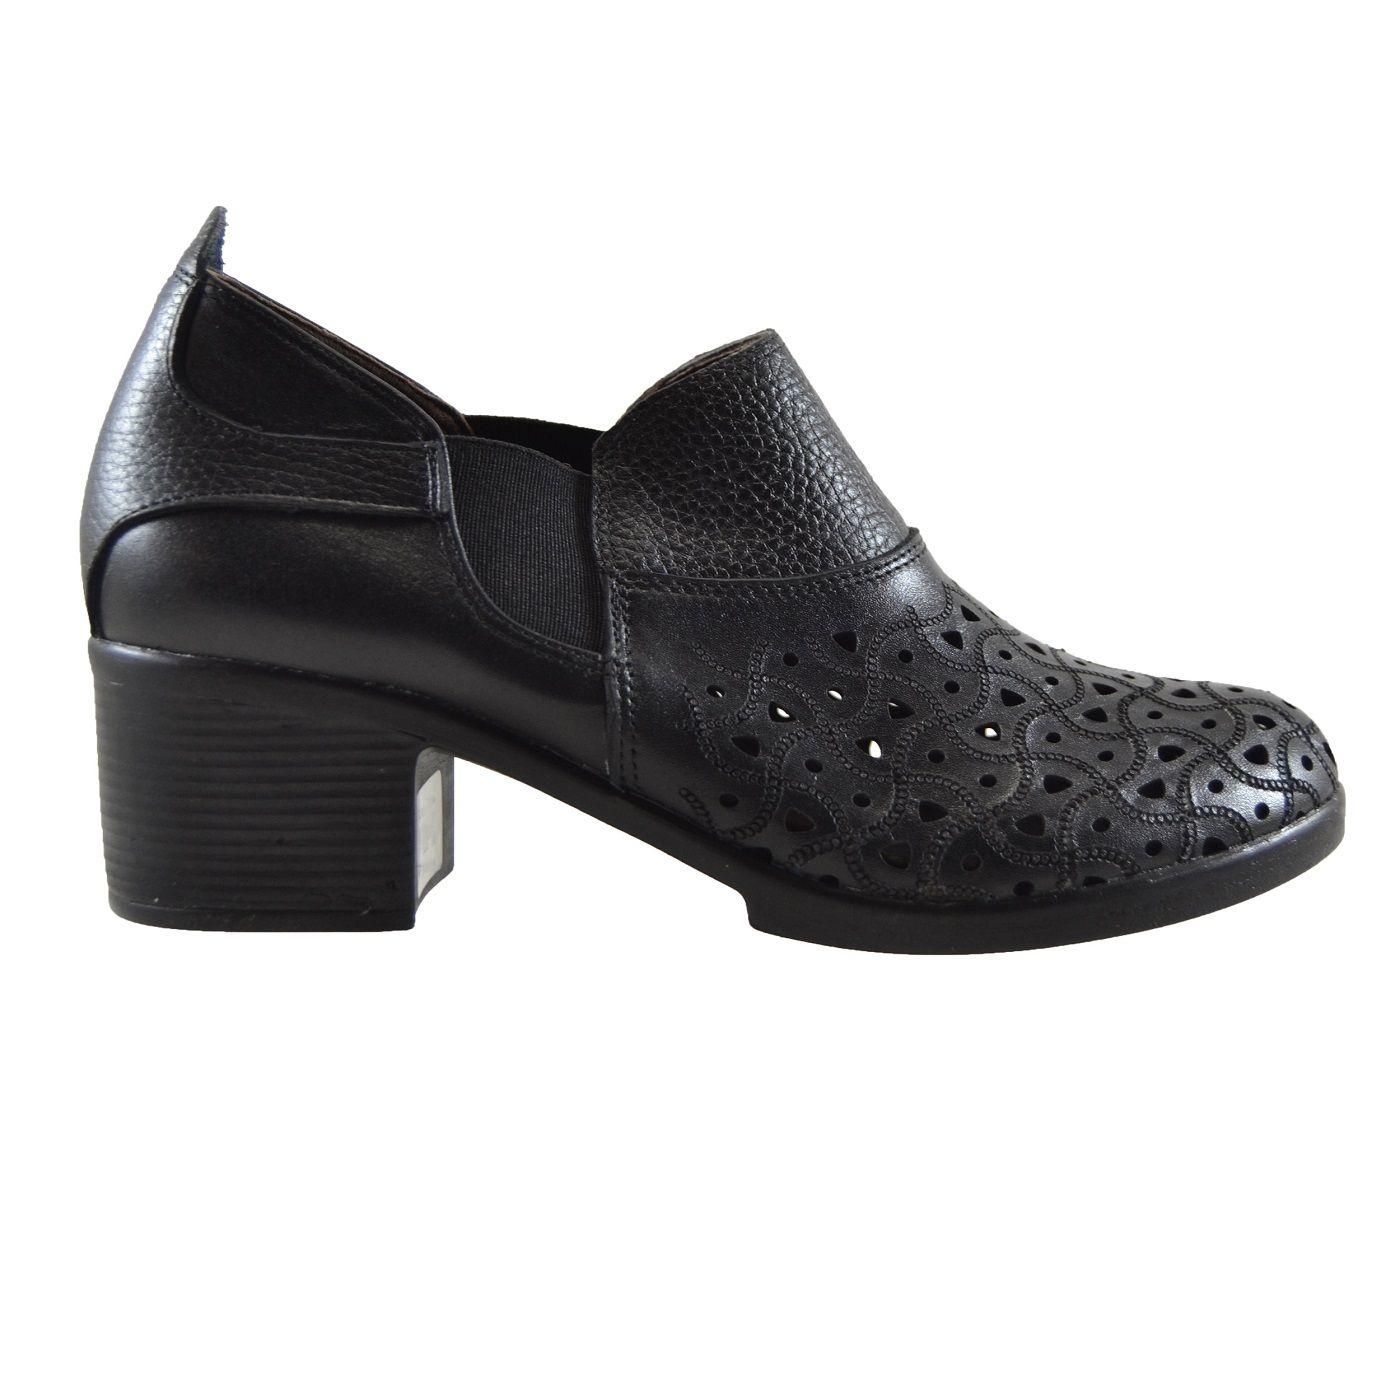 کفش زنانه کد 522 -  - 4